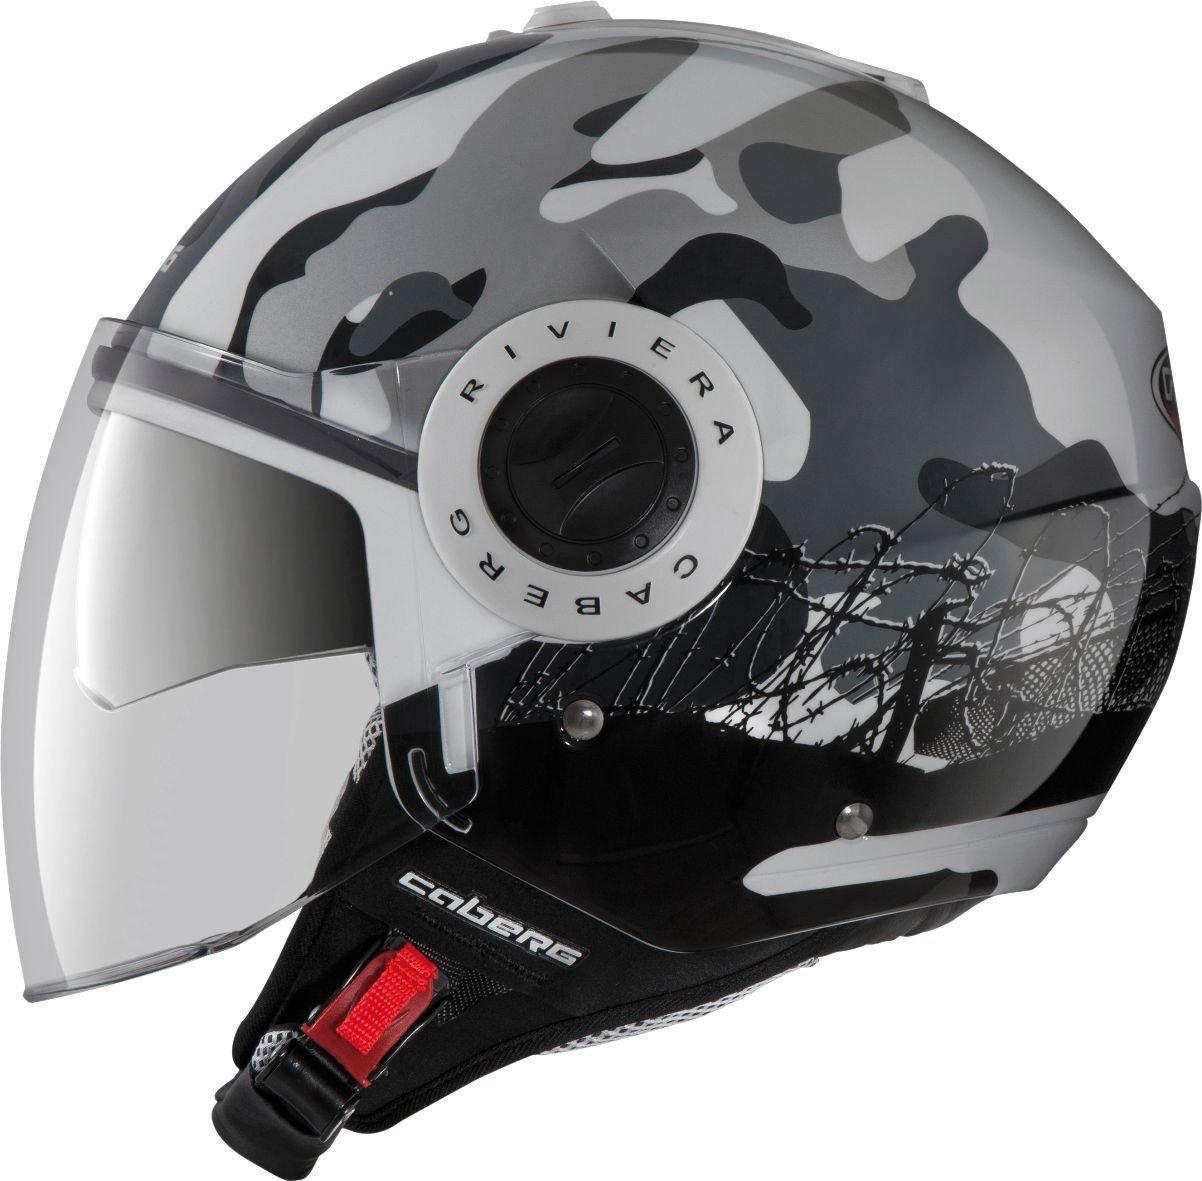 Amazon.com: Caberg Riviera V2+ Open Face Motorcycle Helmet Commander Small: Automotive